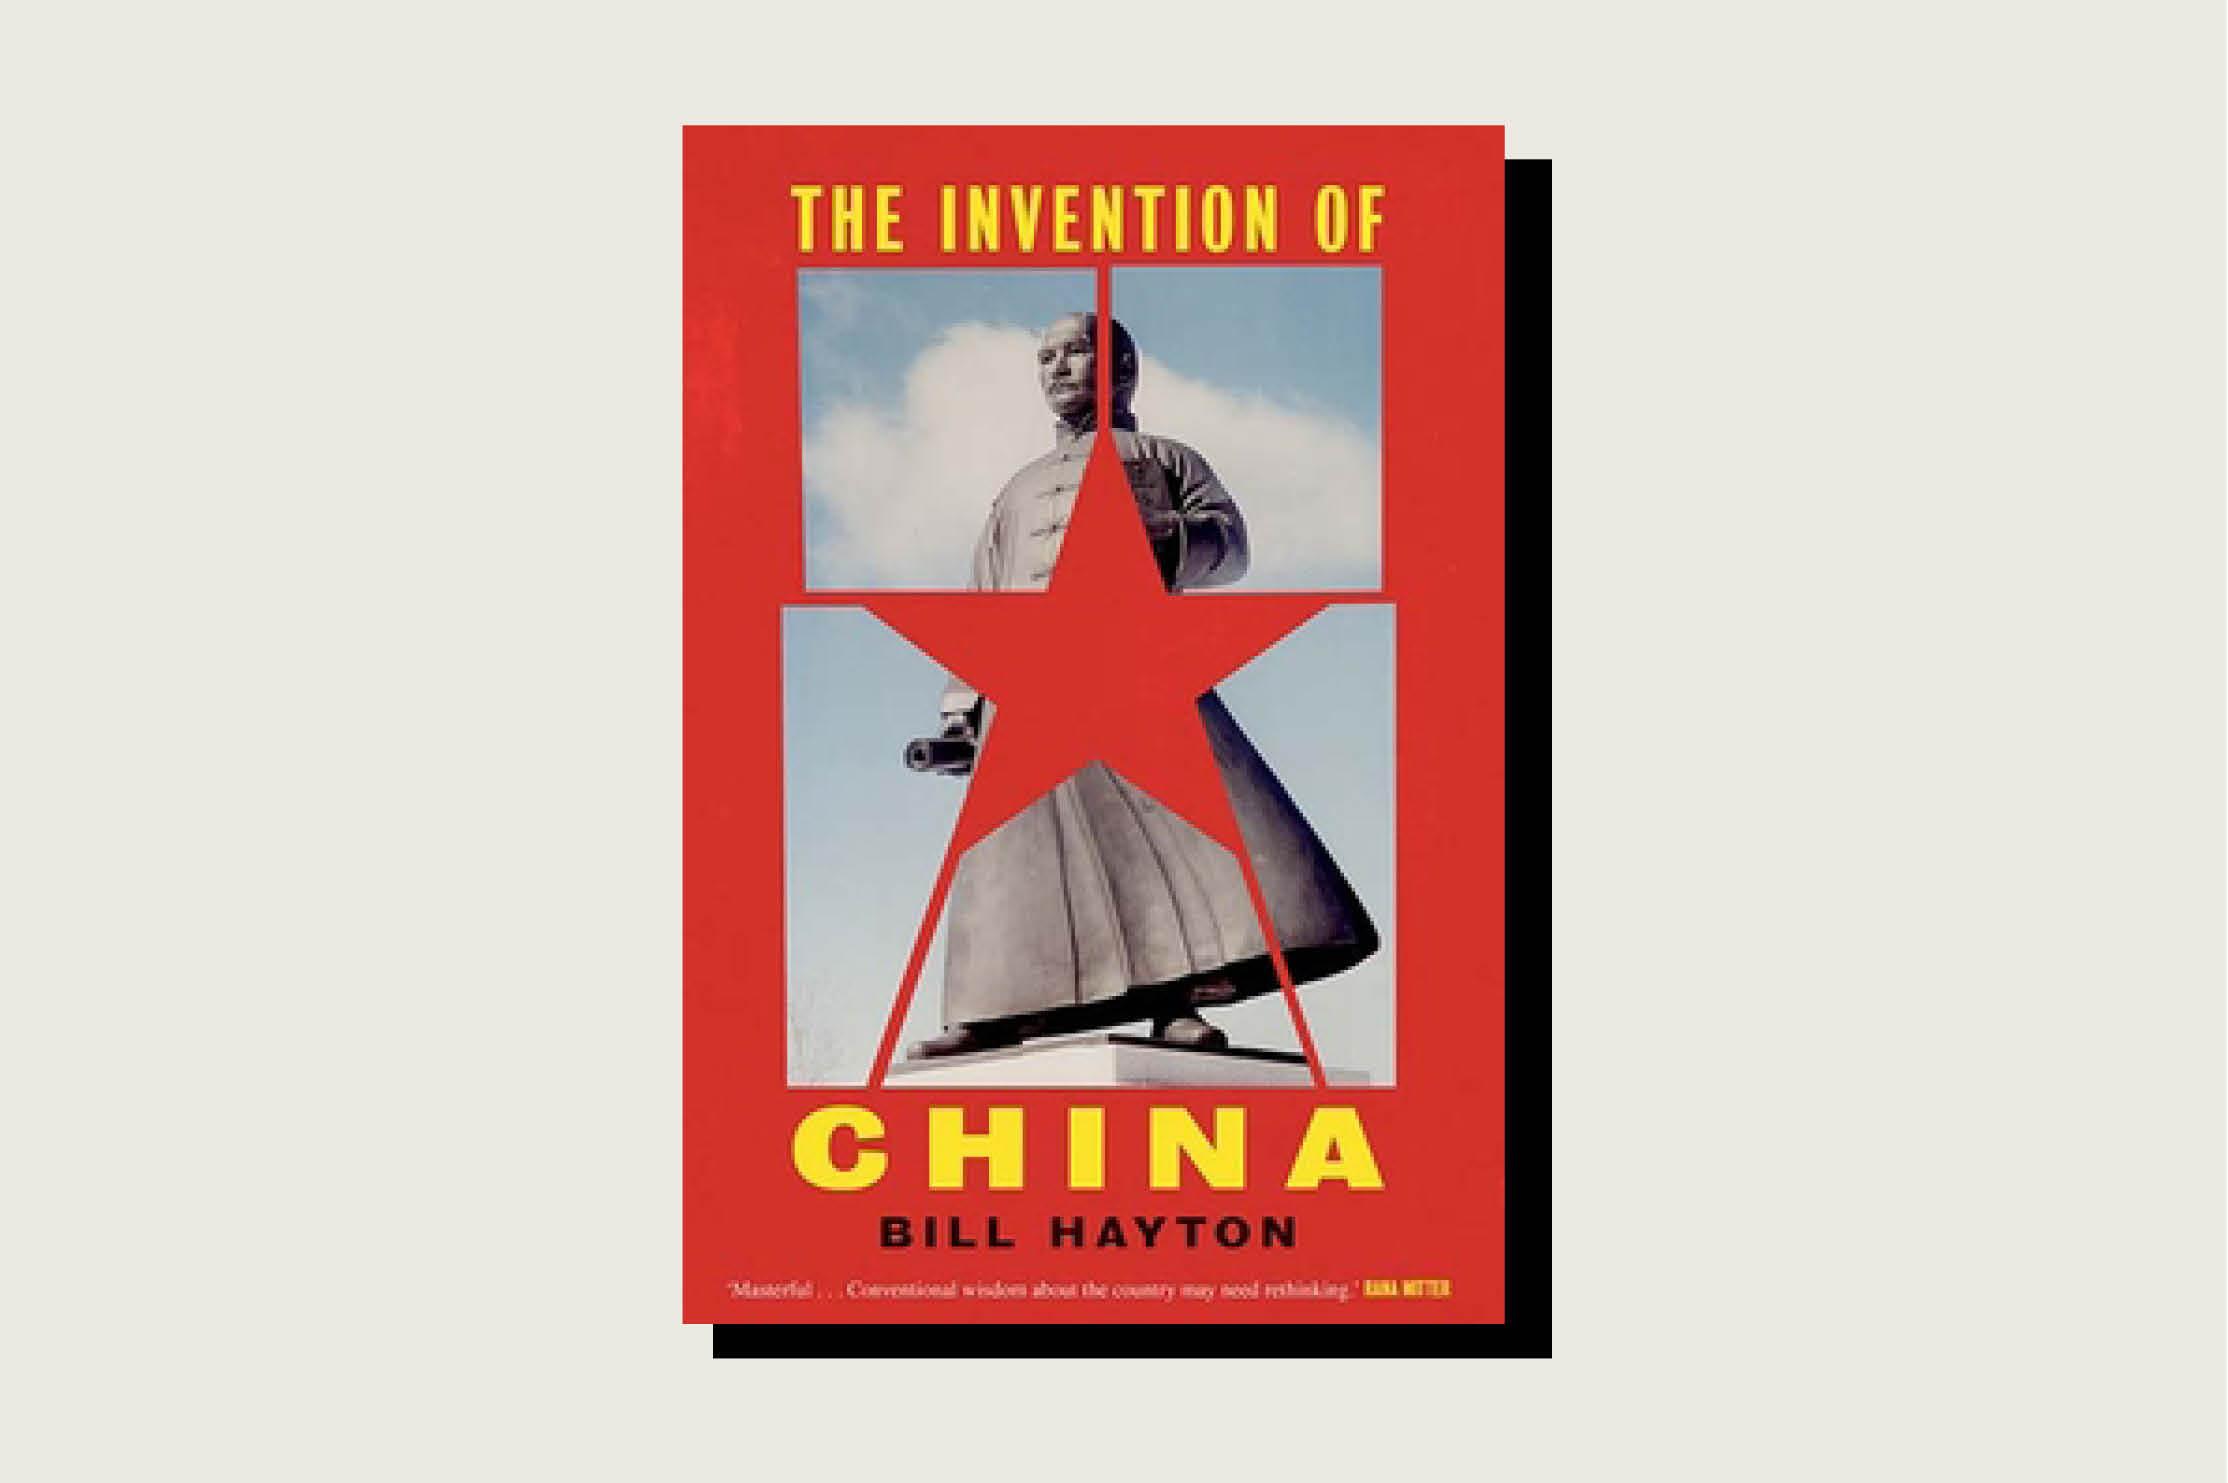 The Invention of China, Bill Hayton, Yale University Press, , November 2020.